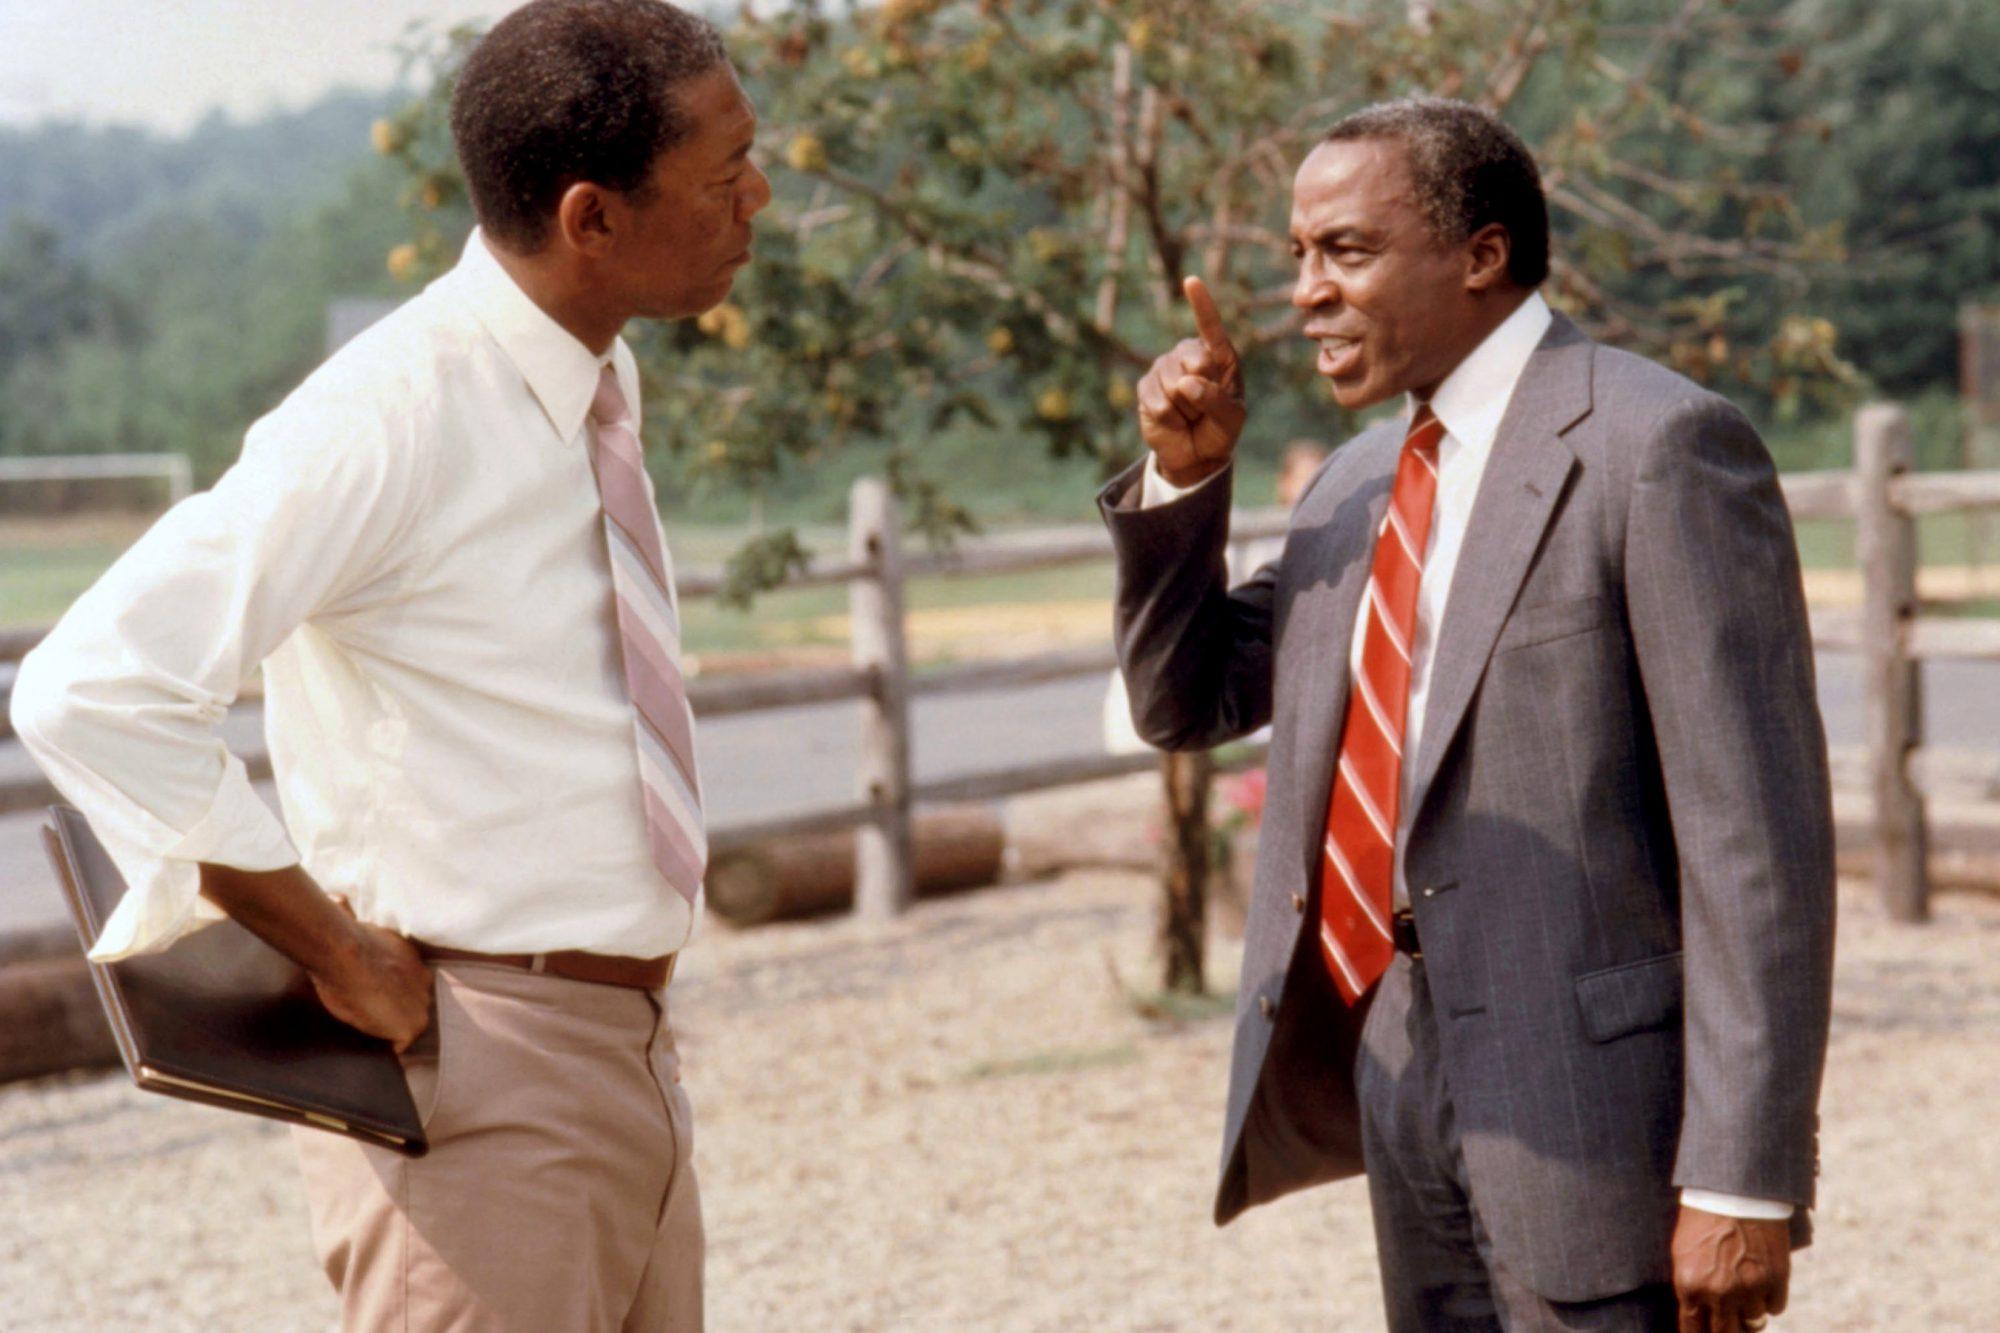 LEAN ON ME, Morgan Freeman, Robert Guilluame, 1989.  ©Warner Brothers/Courtesy Everett Collection